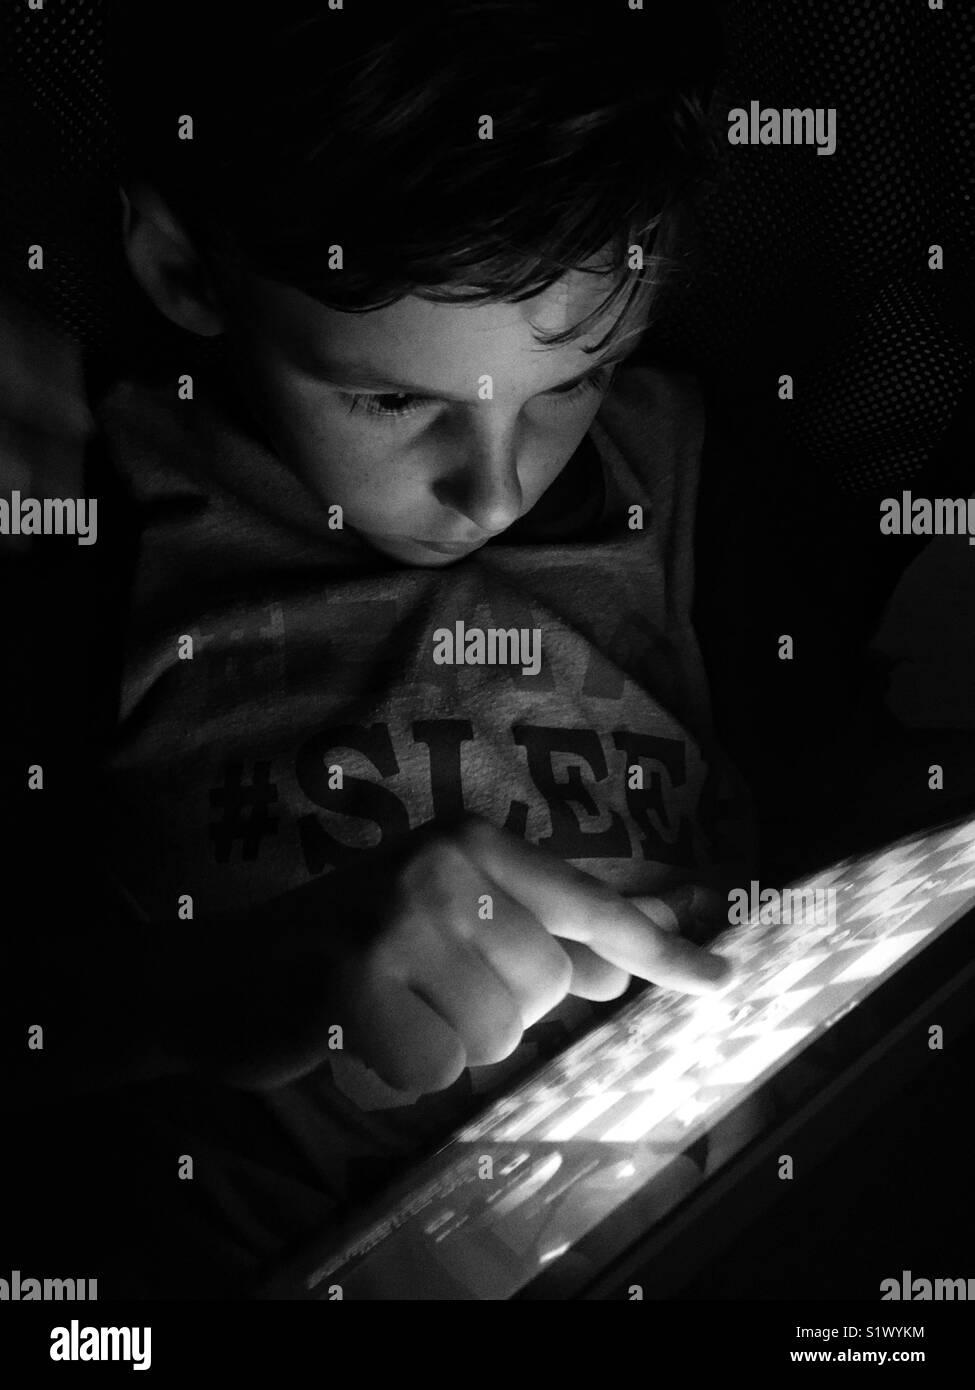 Joven jugando ajedrez en tablet pc Imagen De Stock